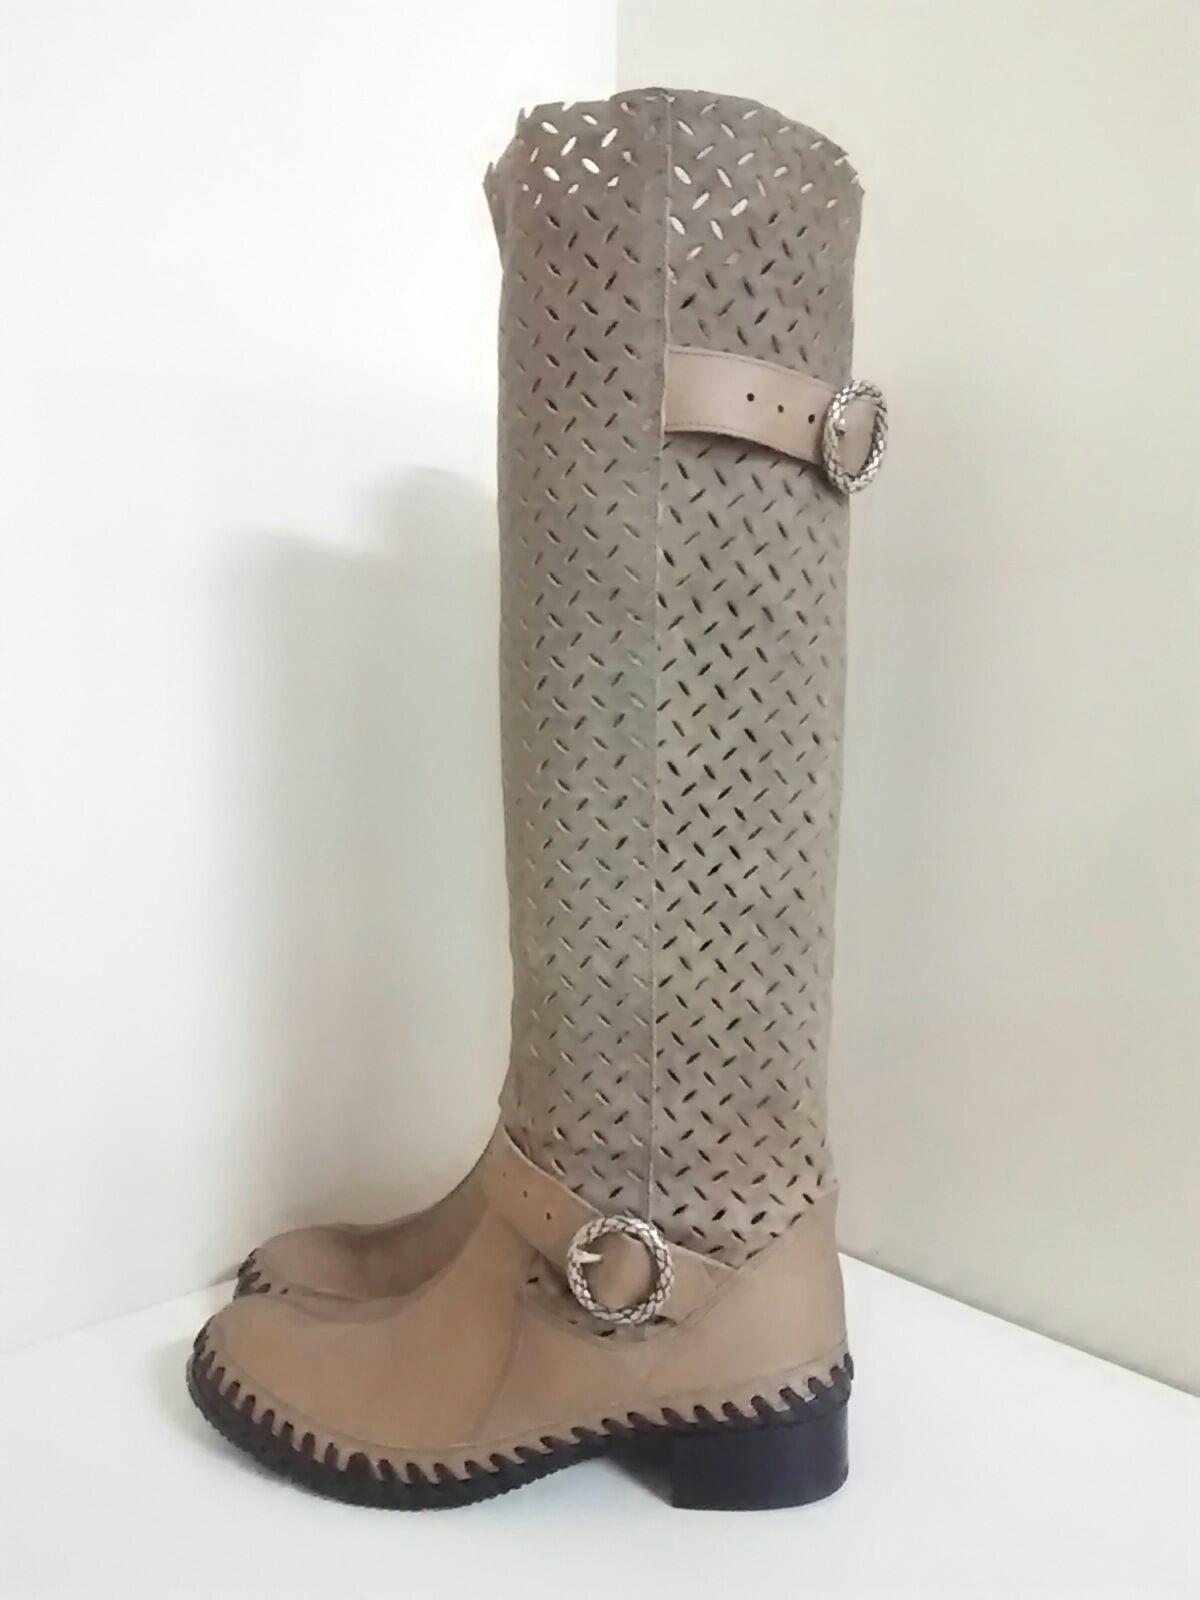 ALEX(アレックス)のブーツ